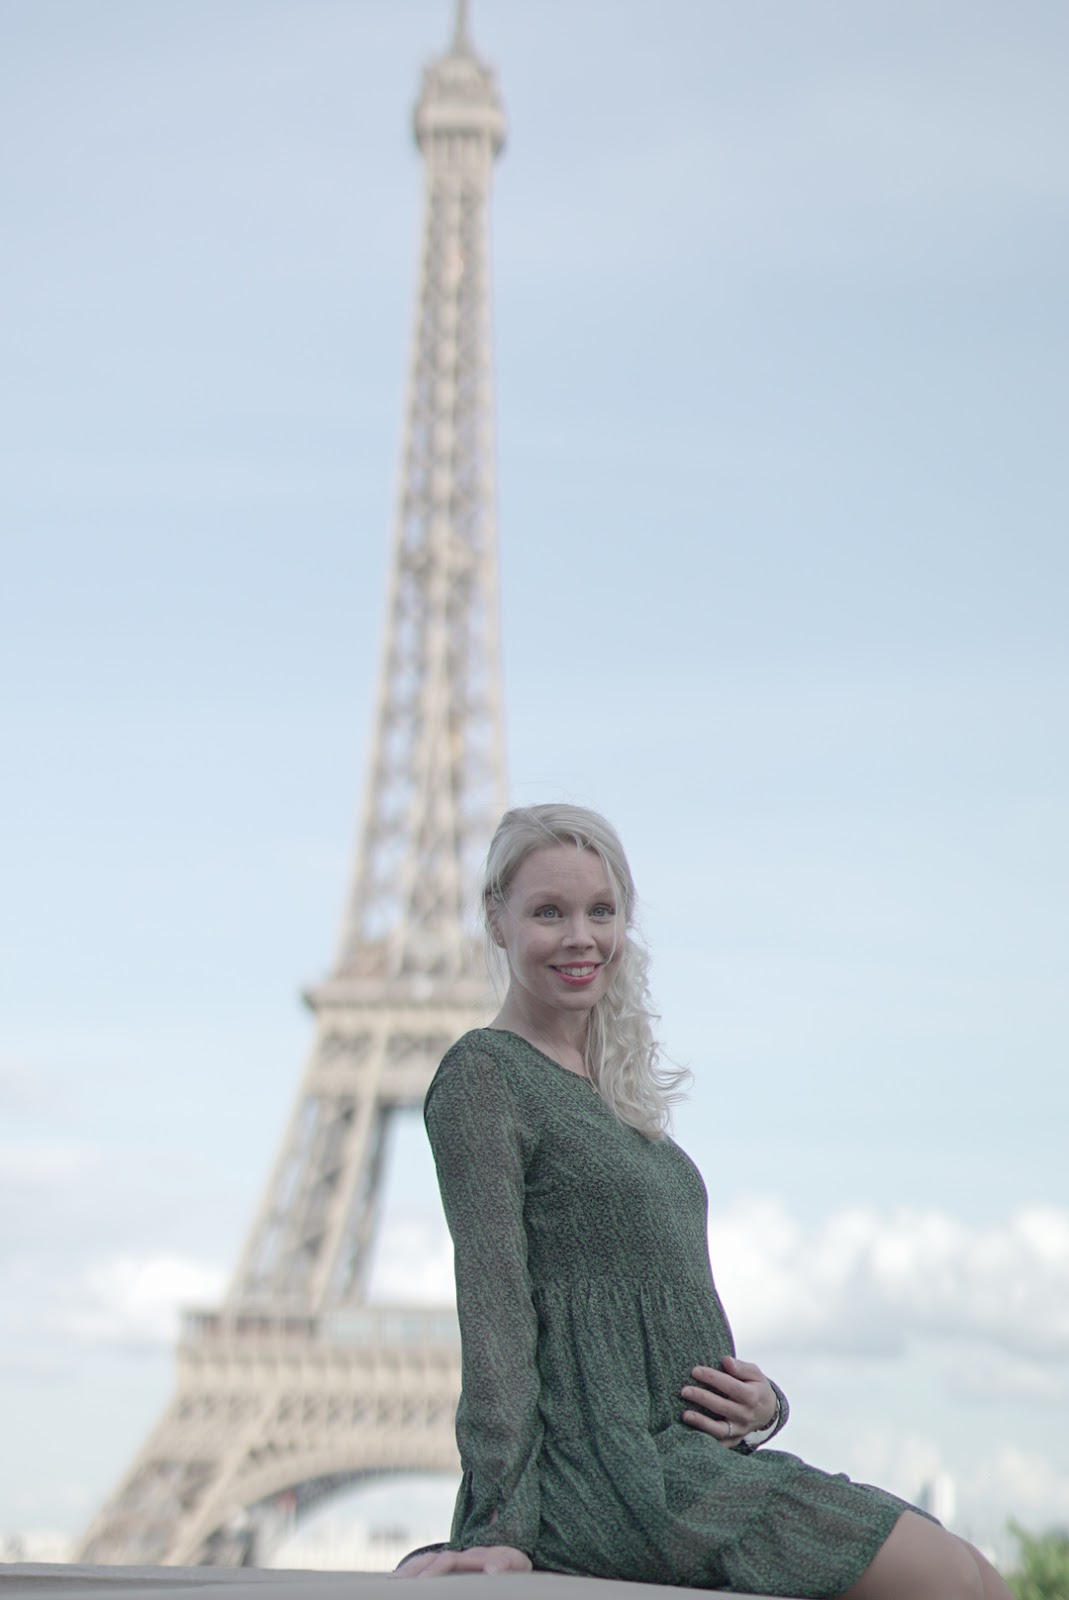 Eiffel-torni ja vauvamaha